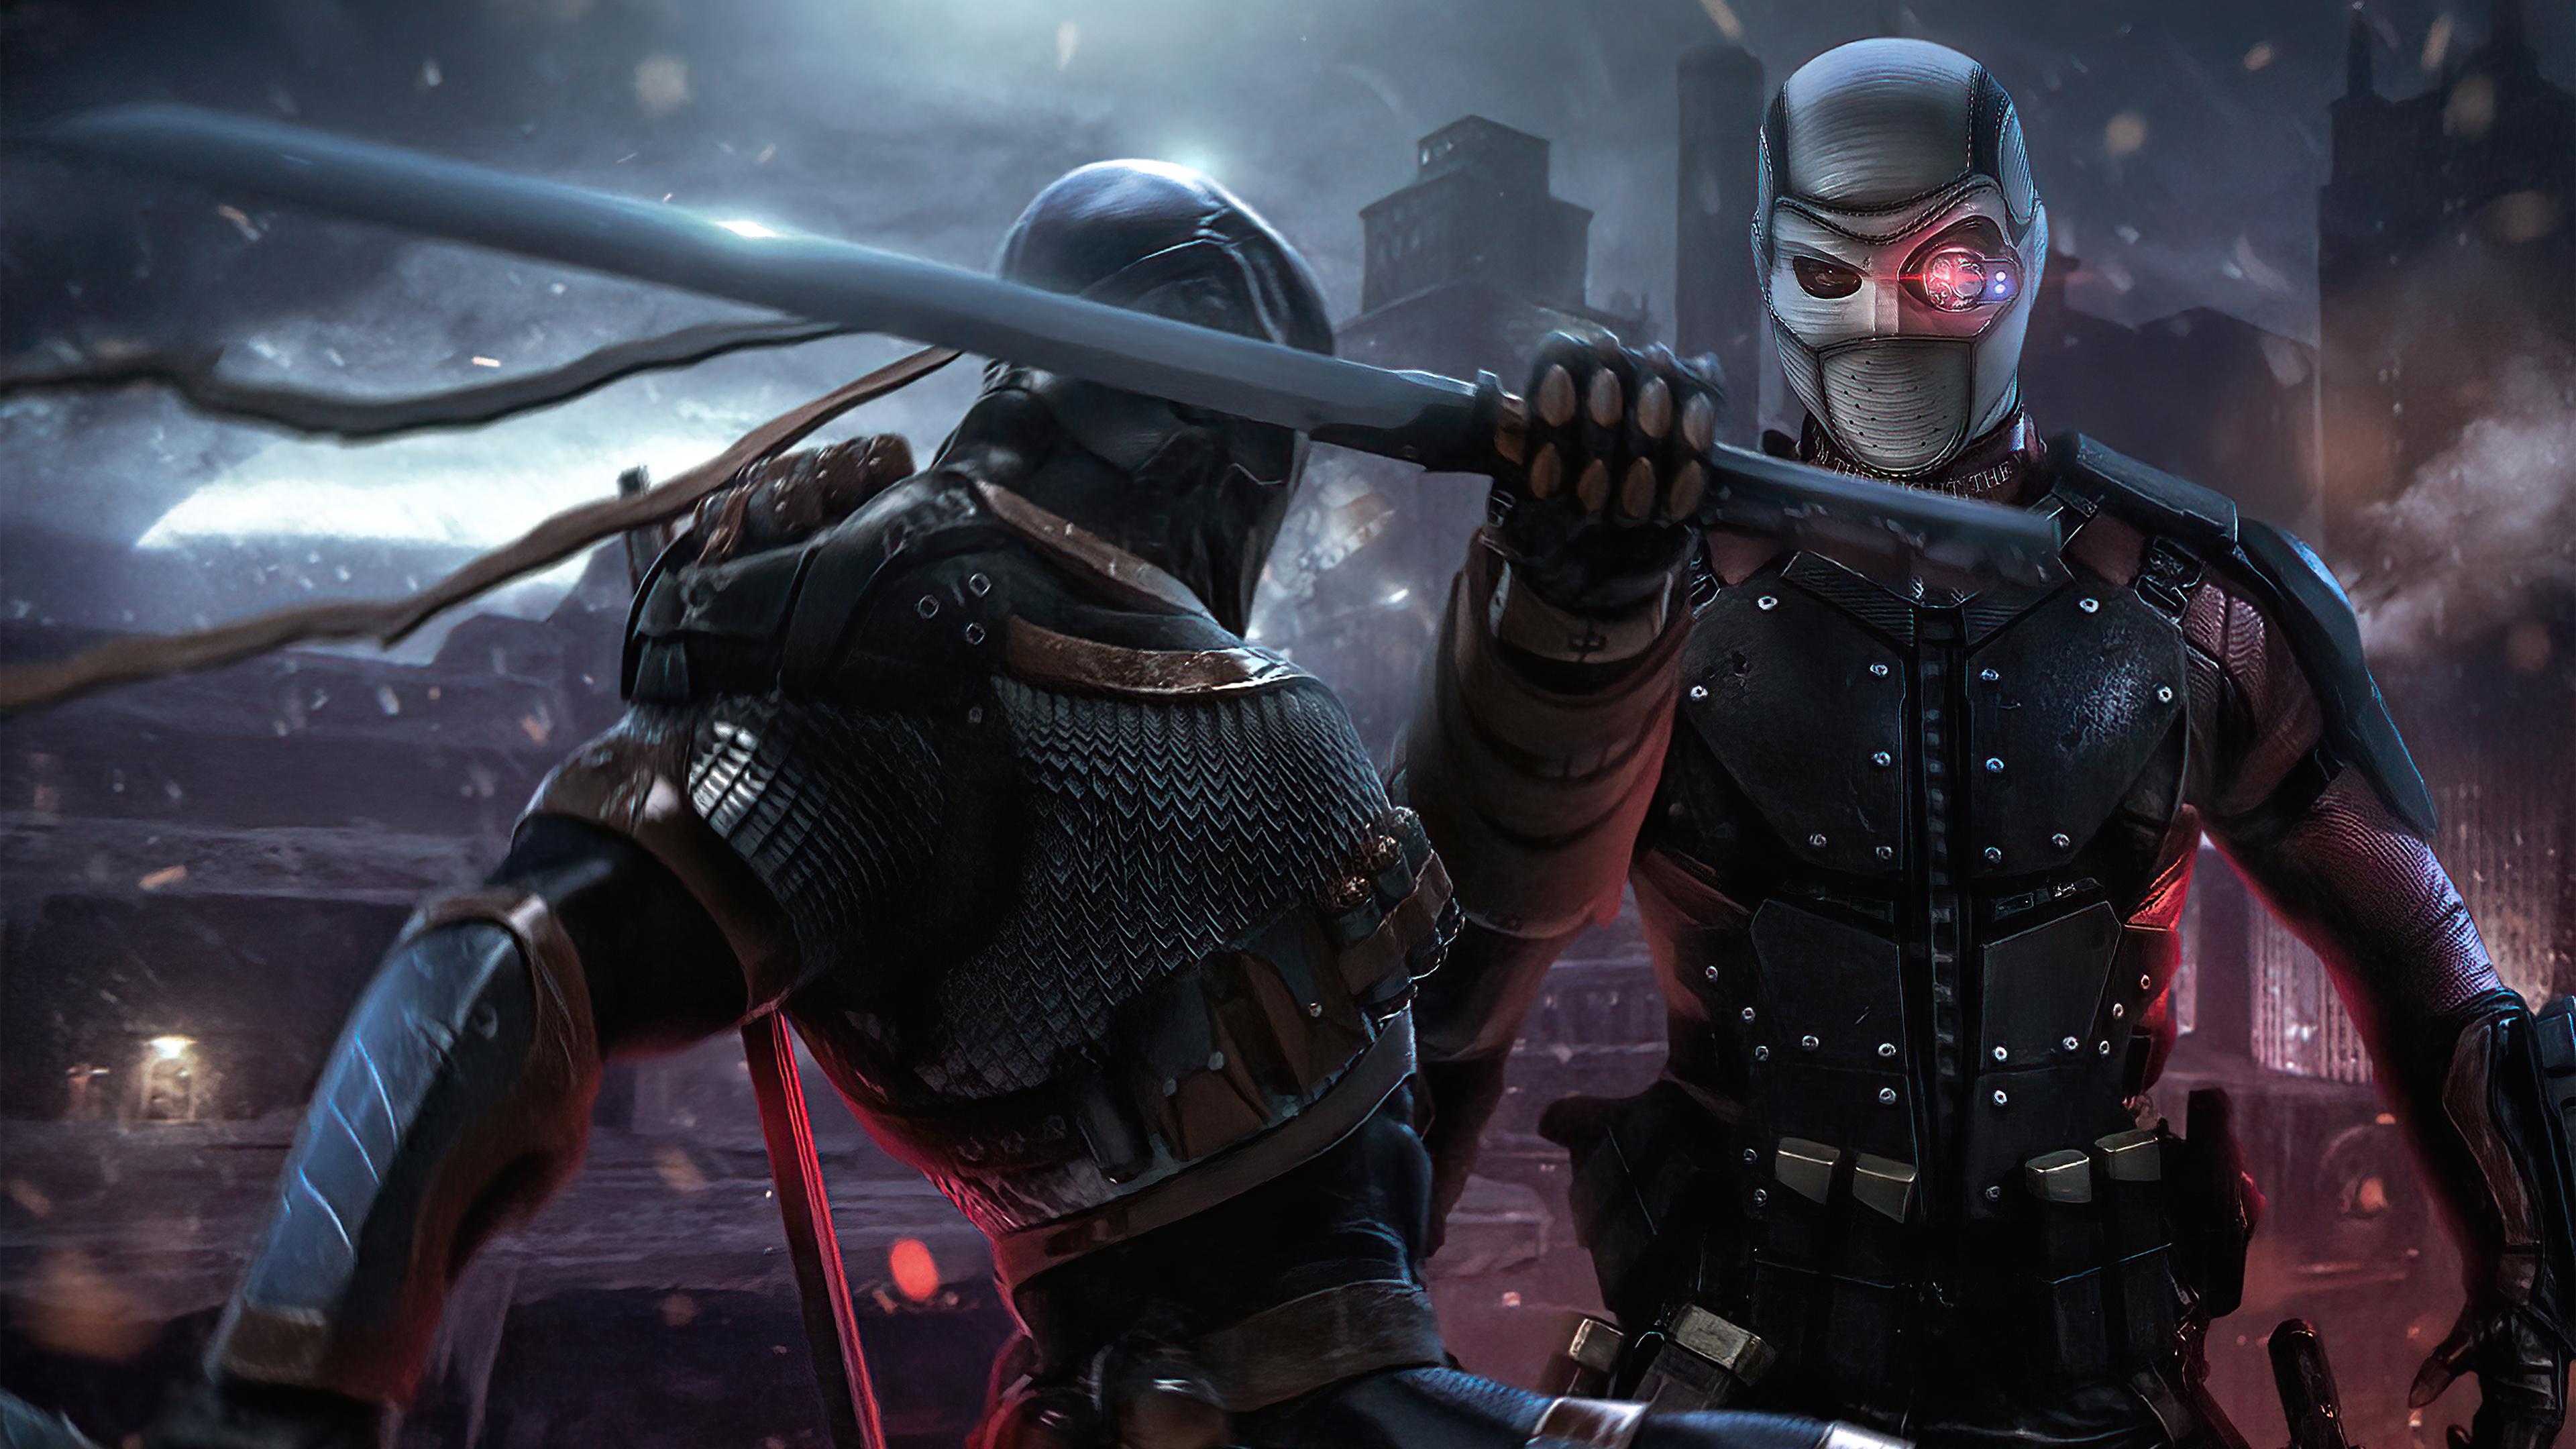 Fondos de pantalla Pelea de Deathstroke vs Deadshot